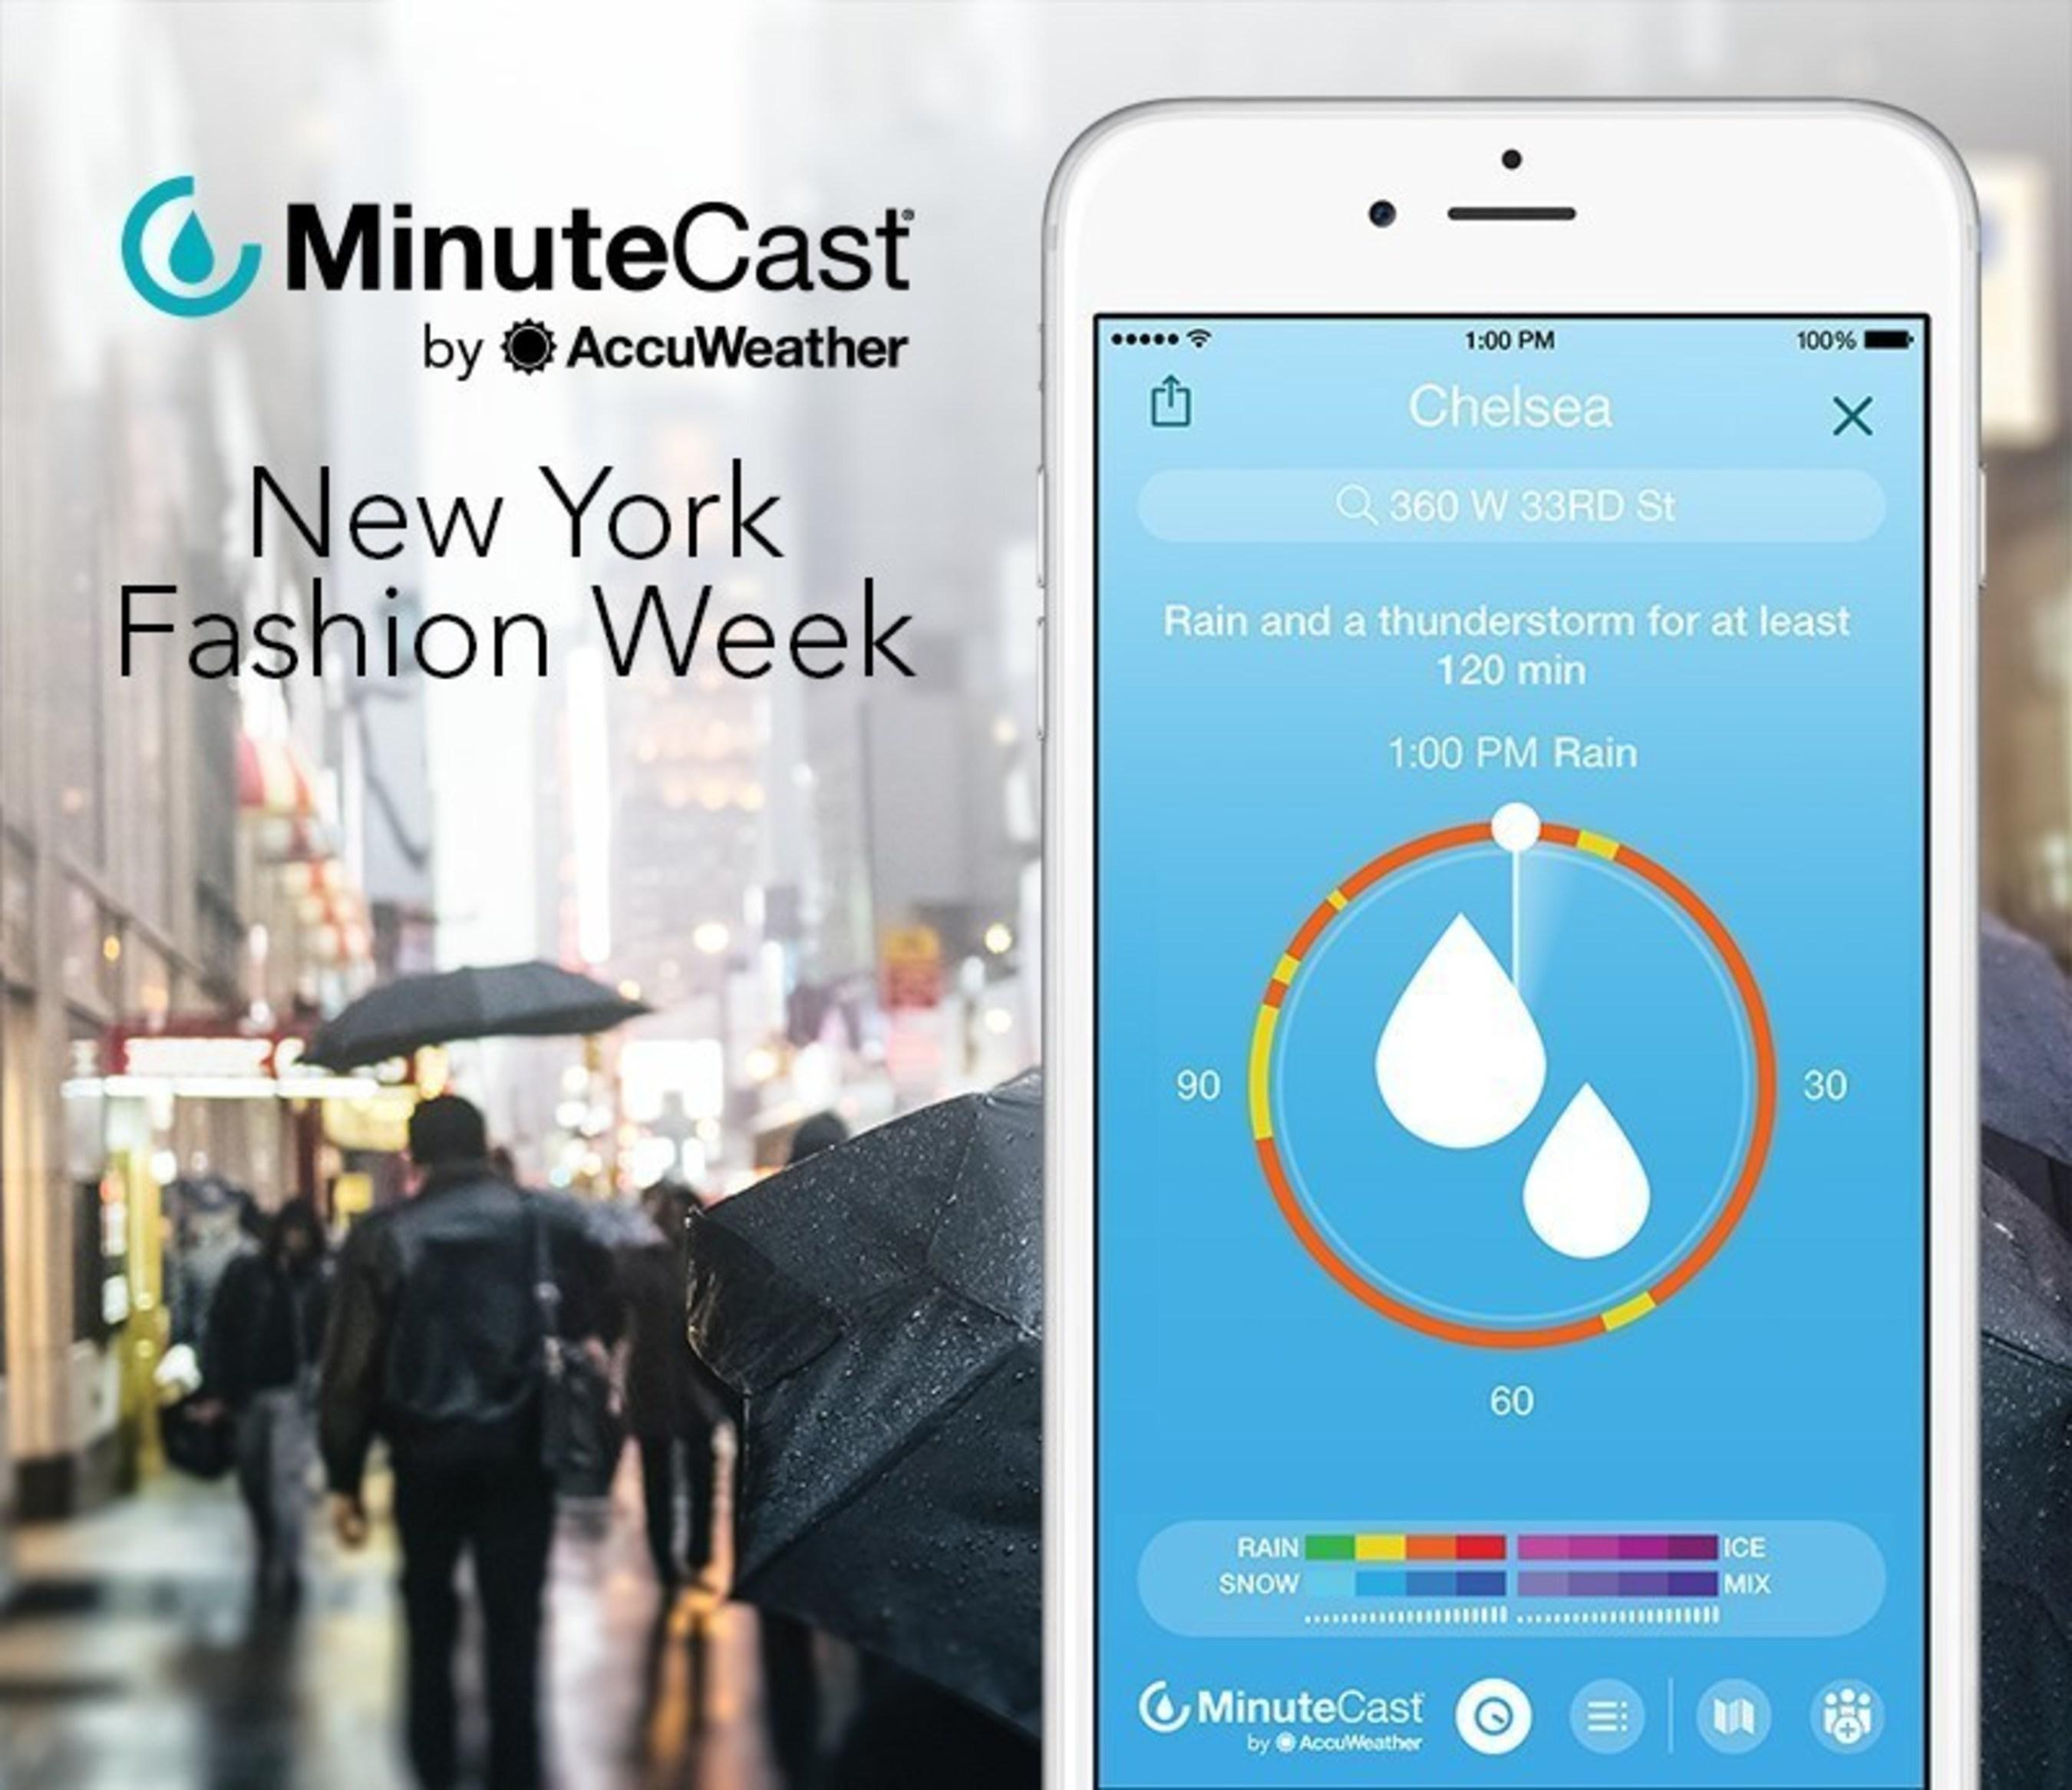 AccuWeather MinuteCast Keeps Fashion-Forward Crowd One Step Ahead of Rain during New York Fashion Week